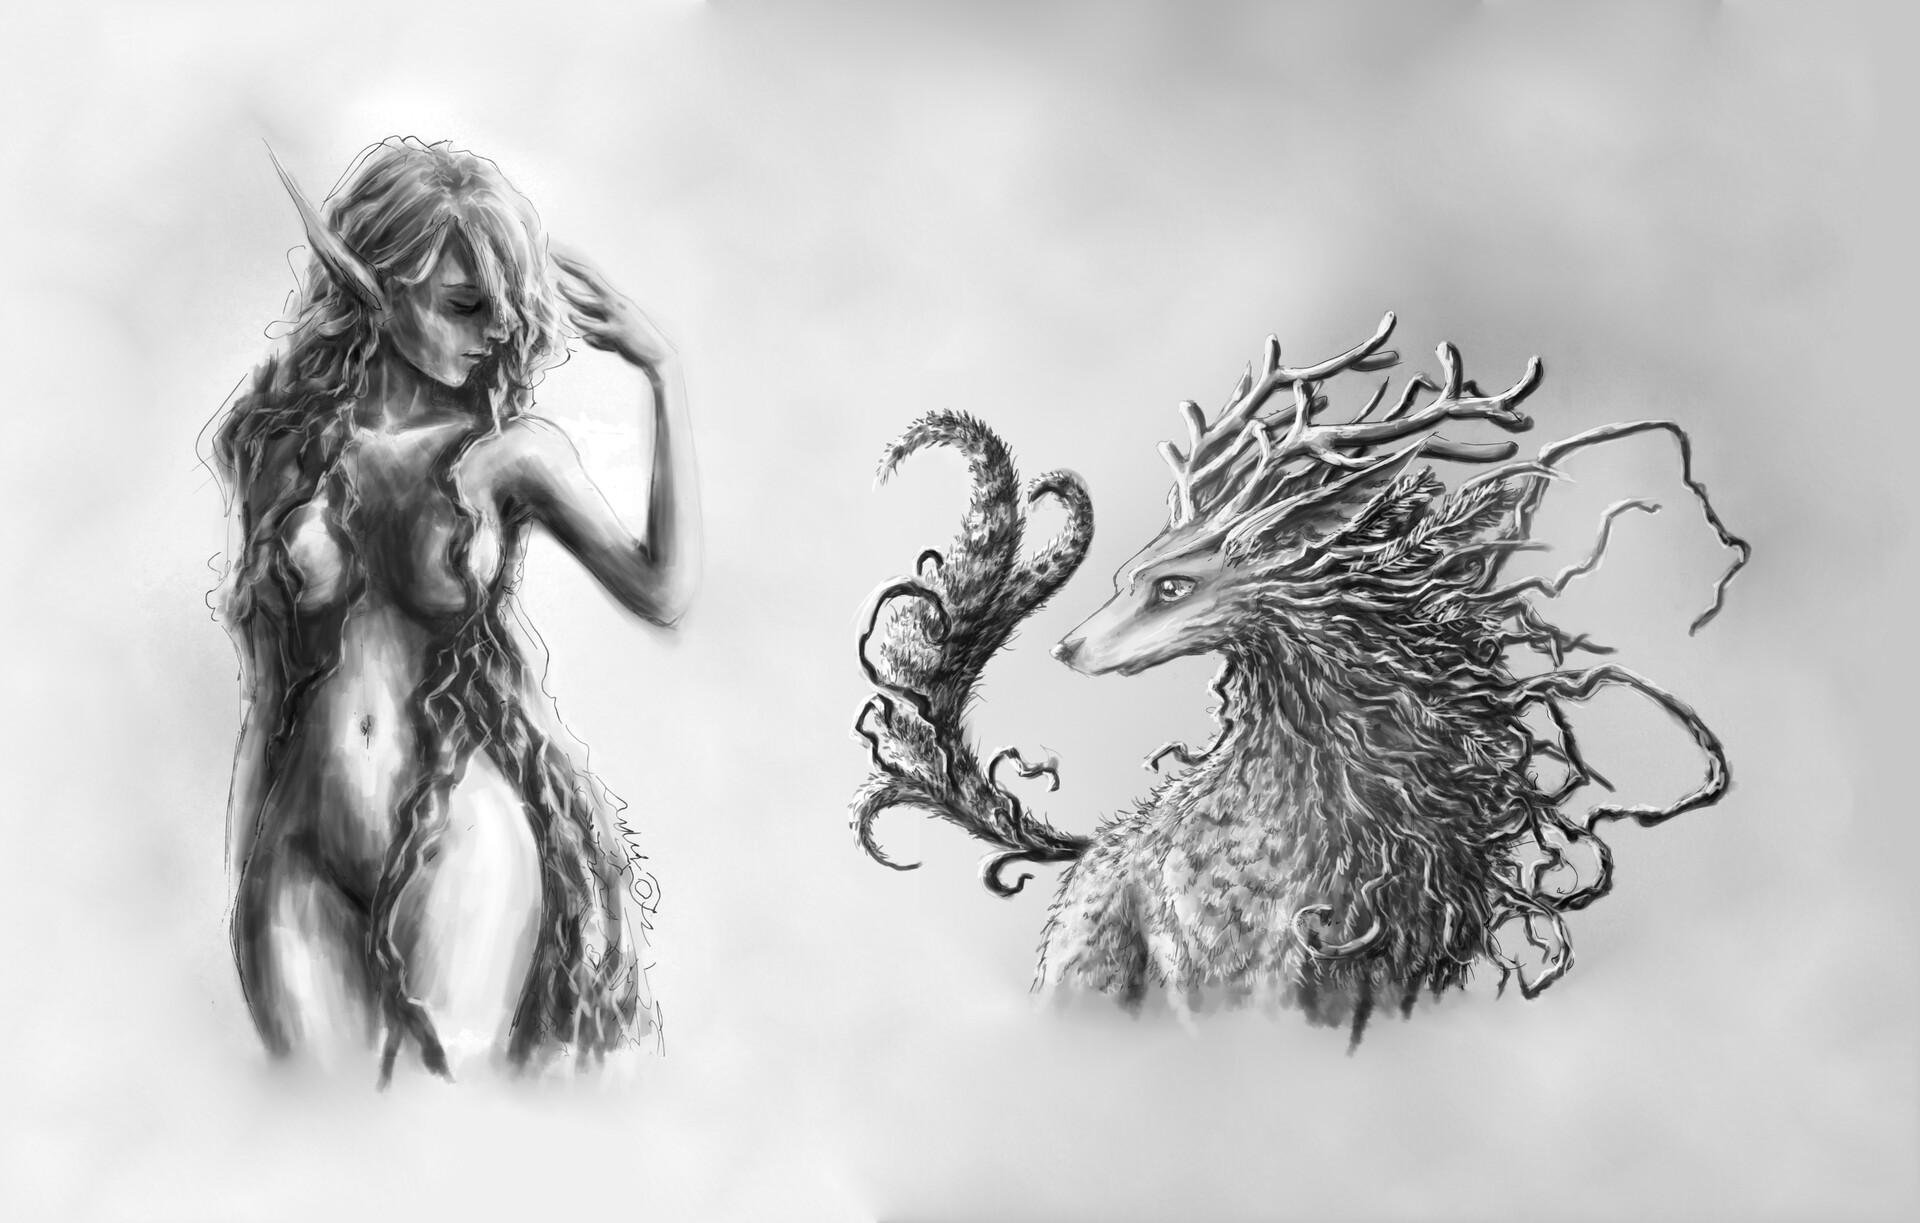 Reena & Sansa